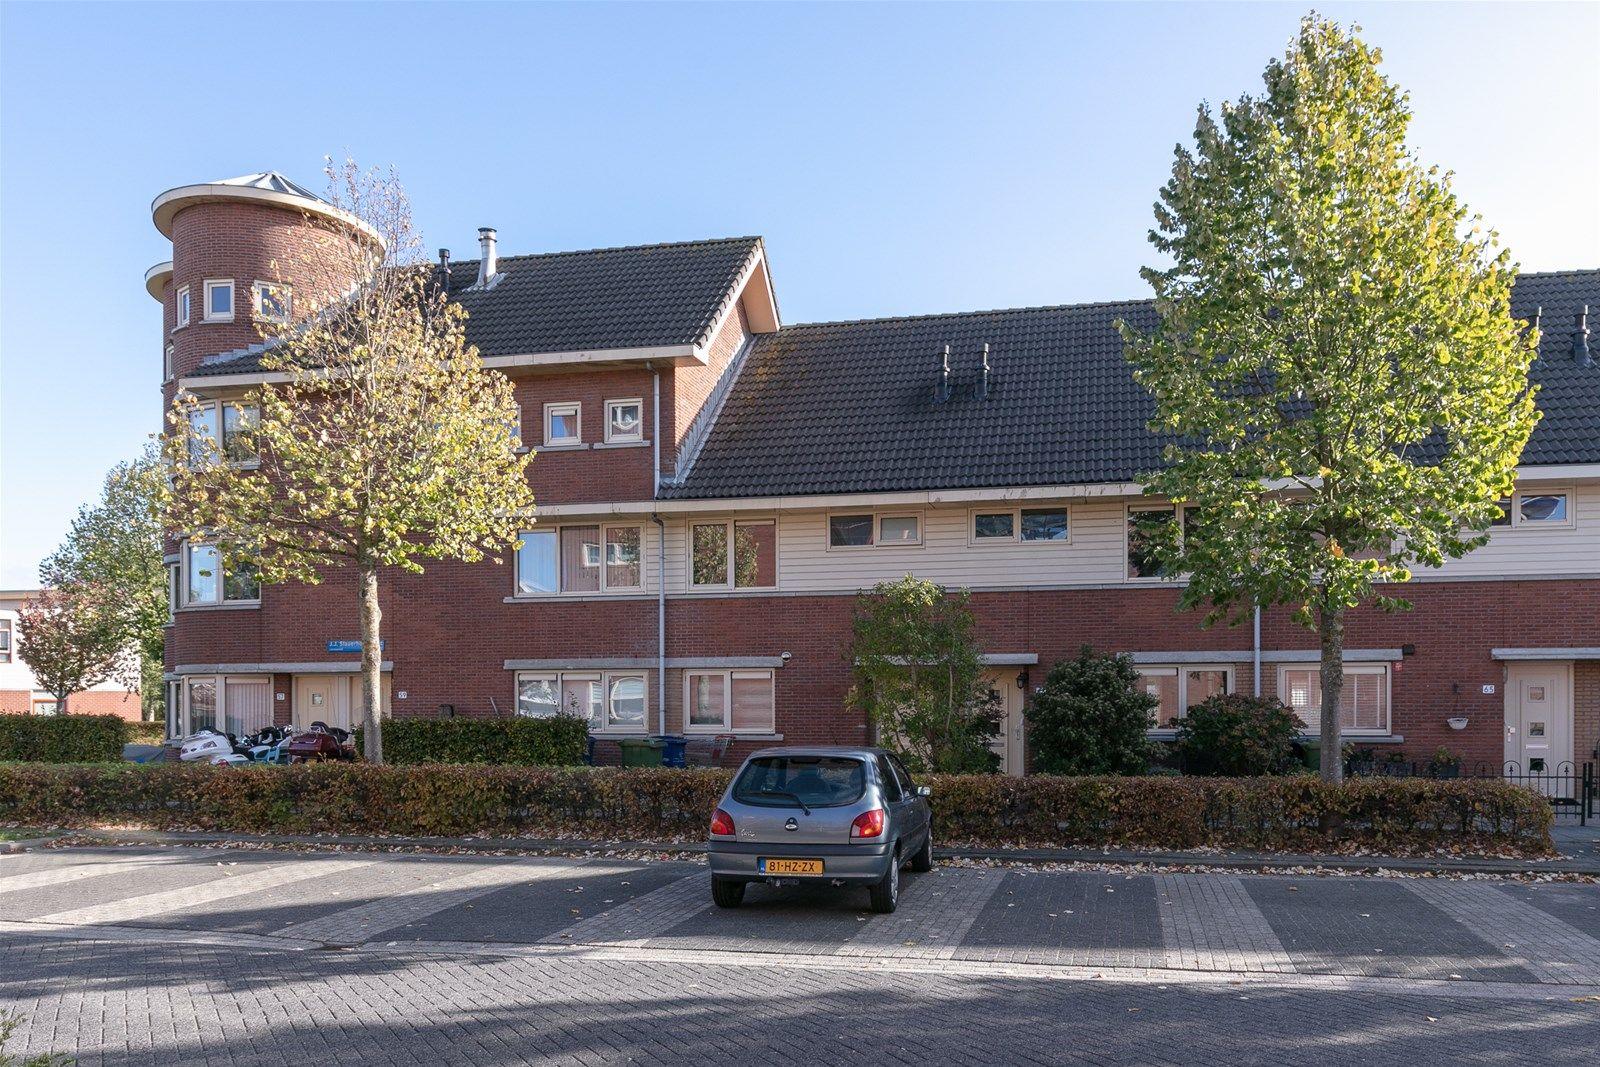 J.J. Slauerhoffstraat 63, Almere